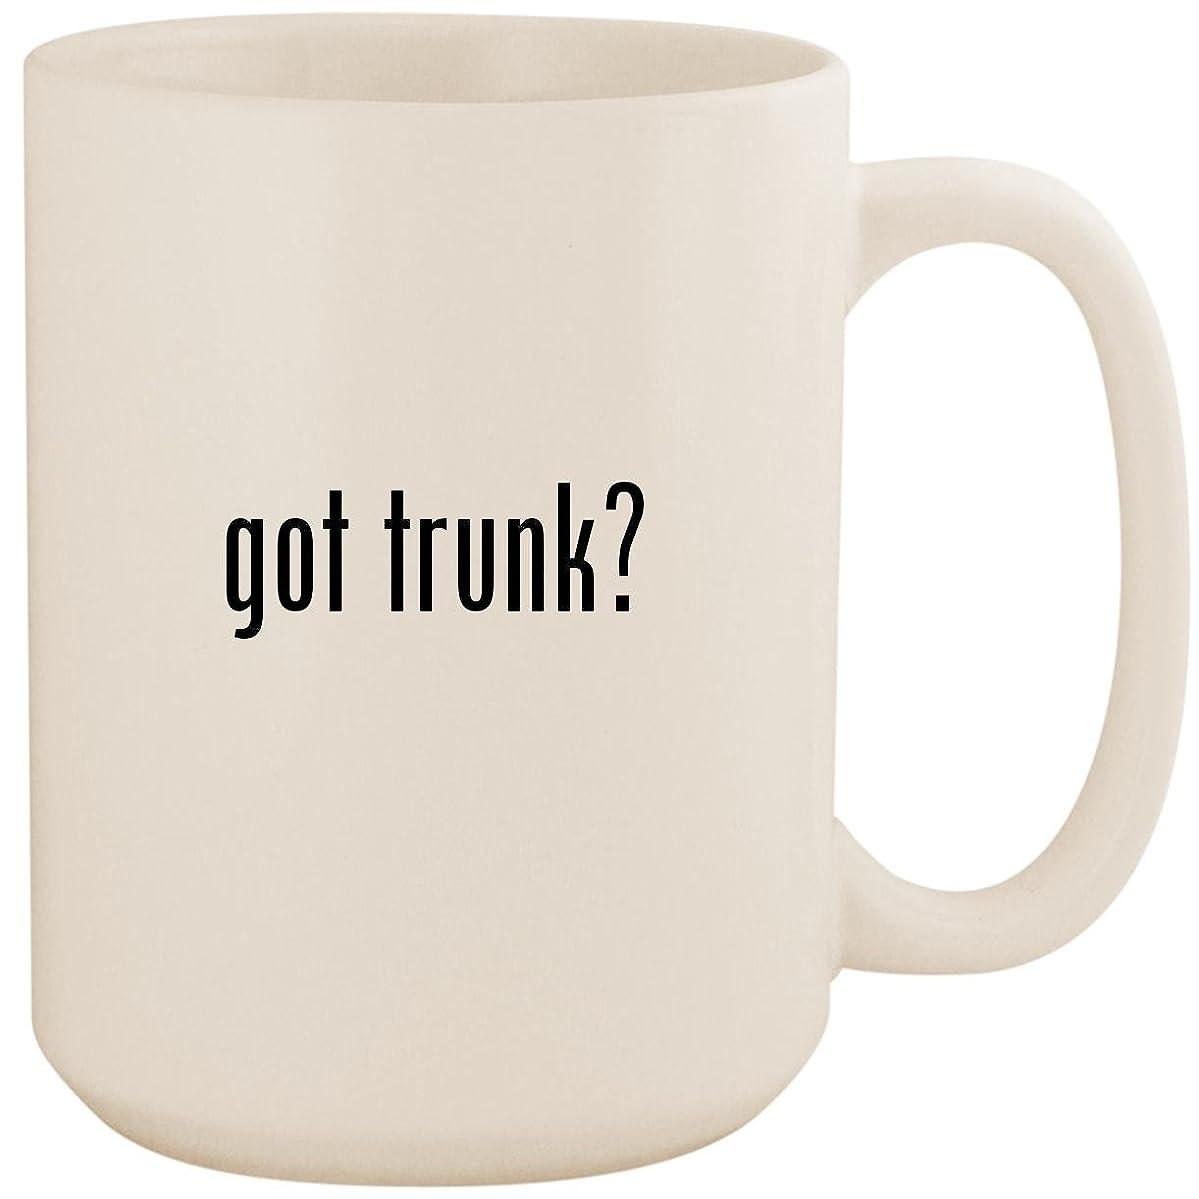 got trunk? - White 15oz Ceramic Coffee Mug Cup